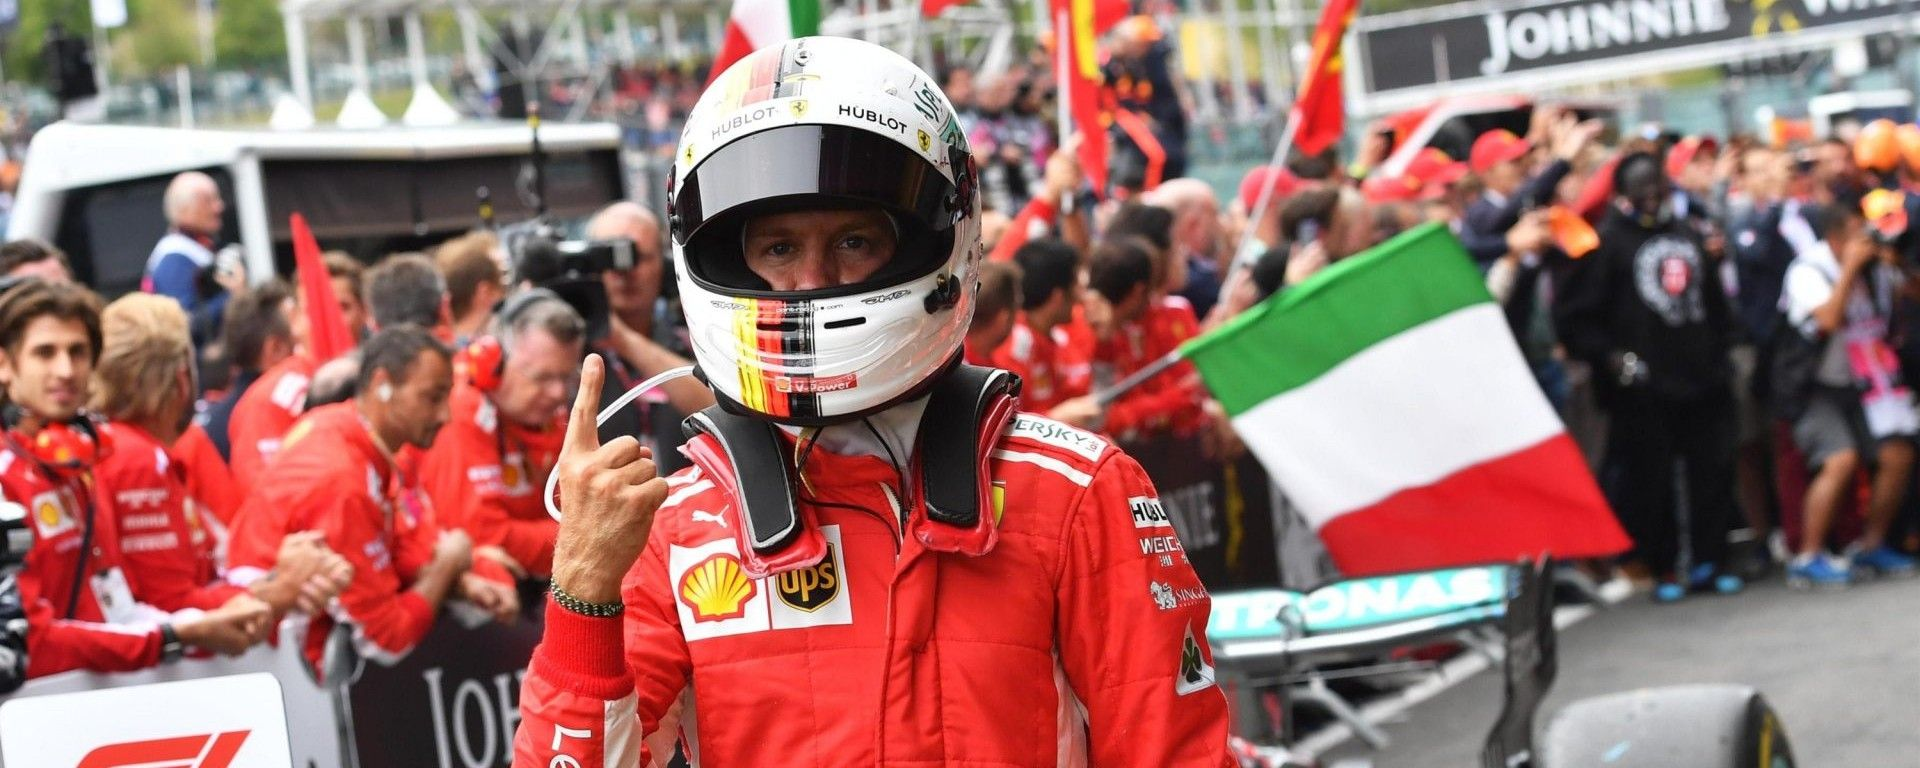 GP Belgio 2018, Spa Francorchamps: Sebastian Vettel festeggia la vittoria con la Ferrari